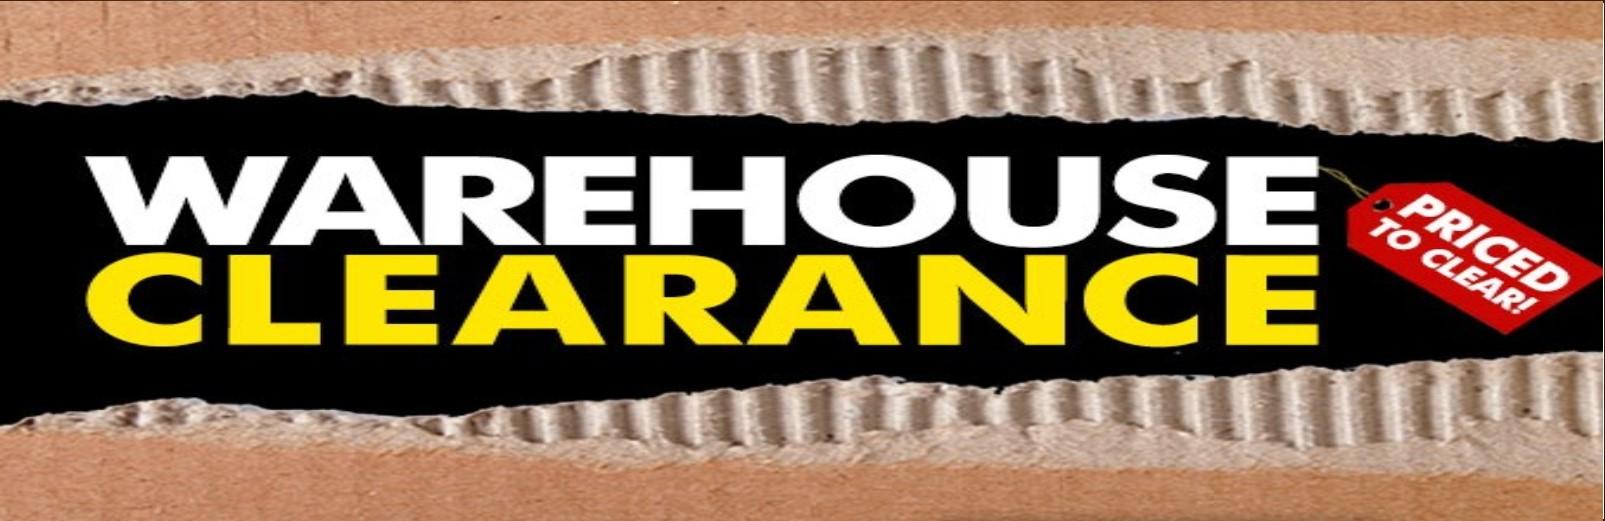 Warehouse Clearance Sale